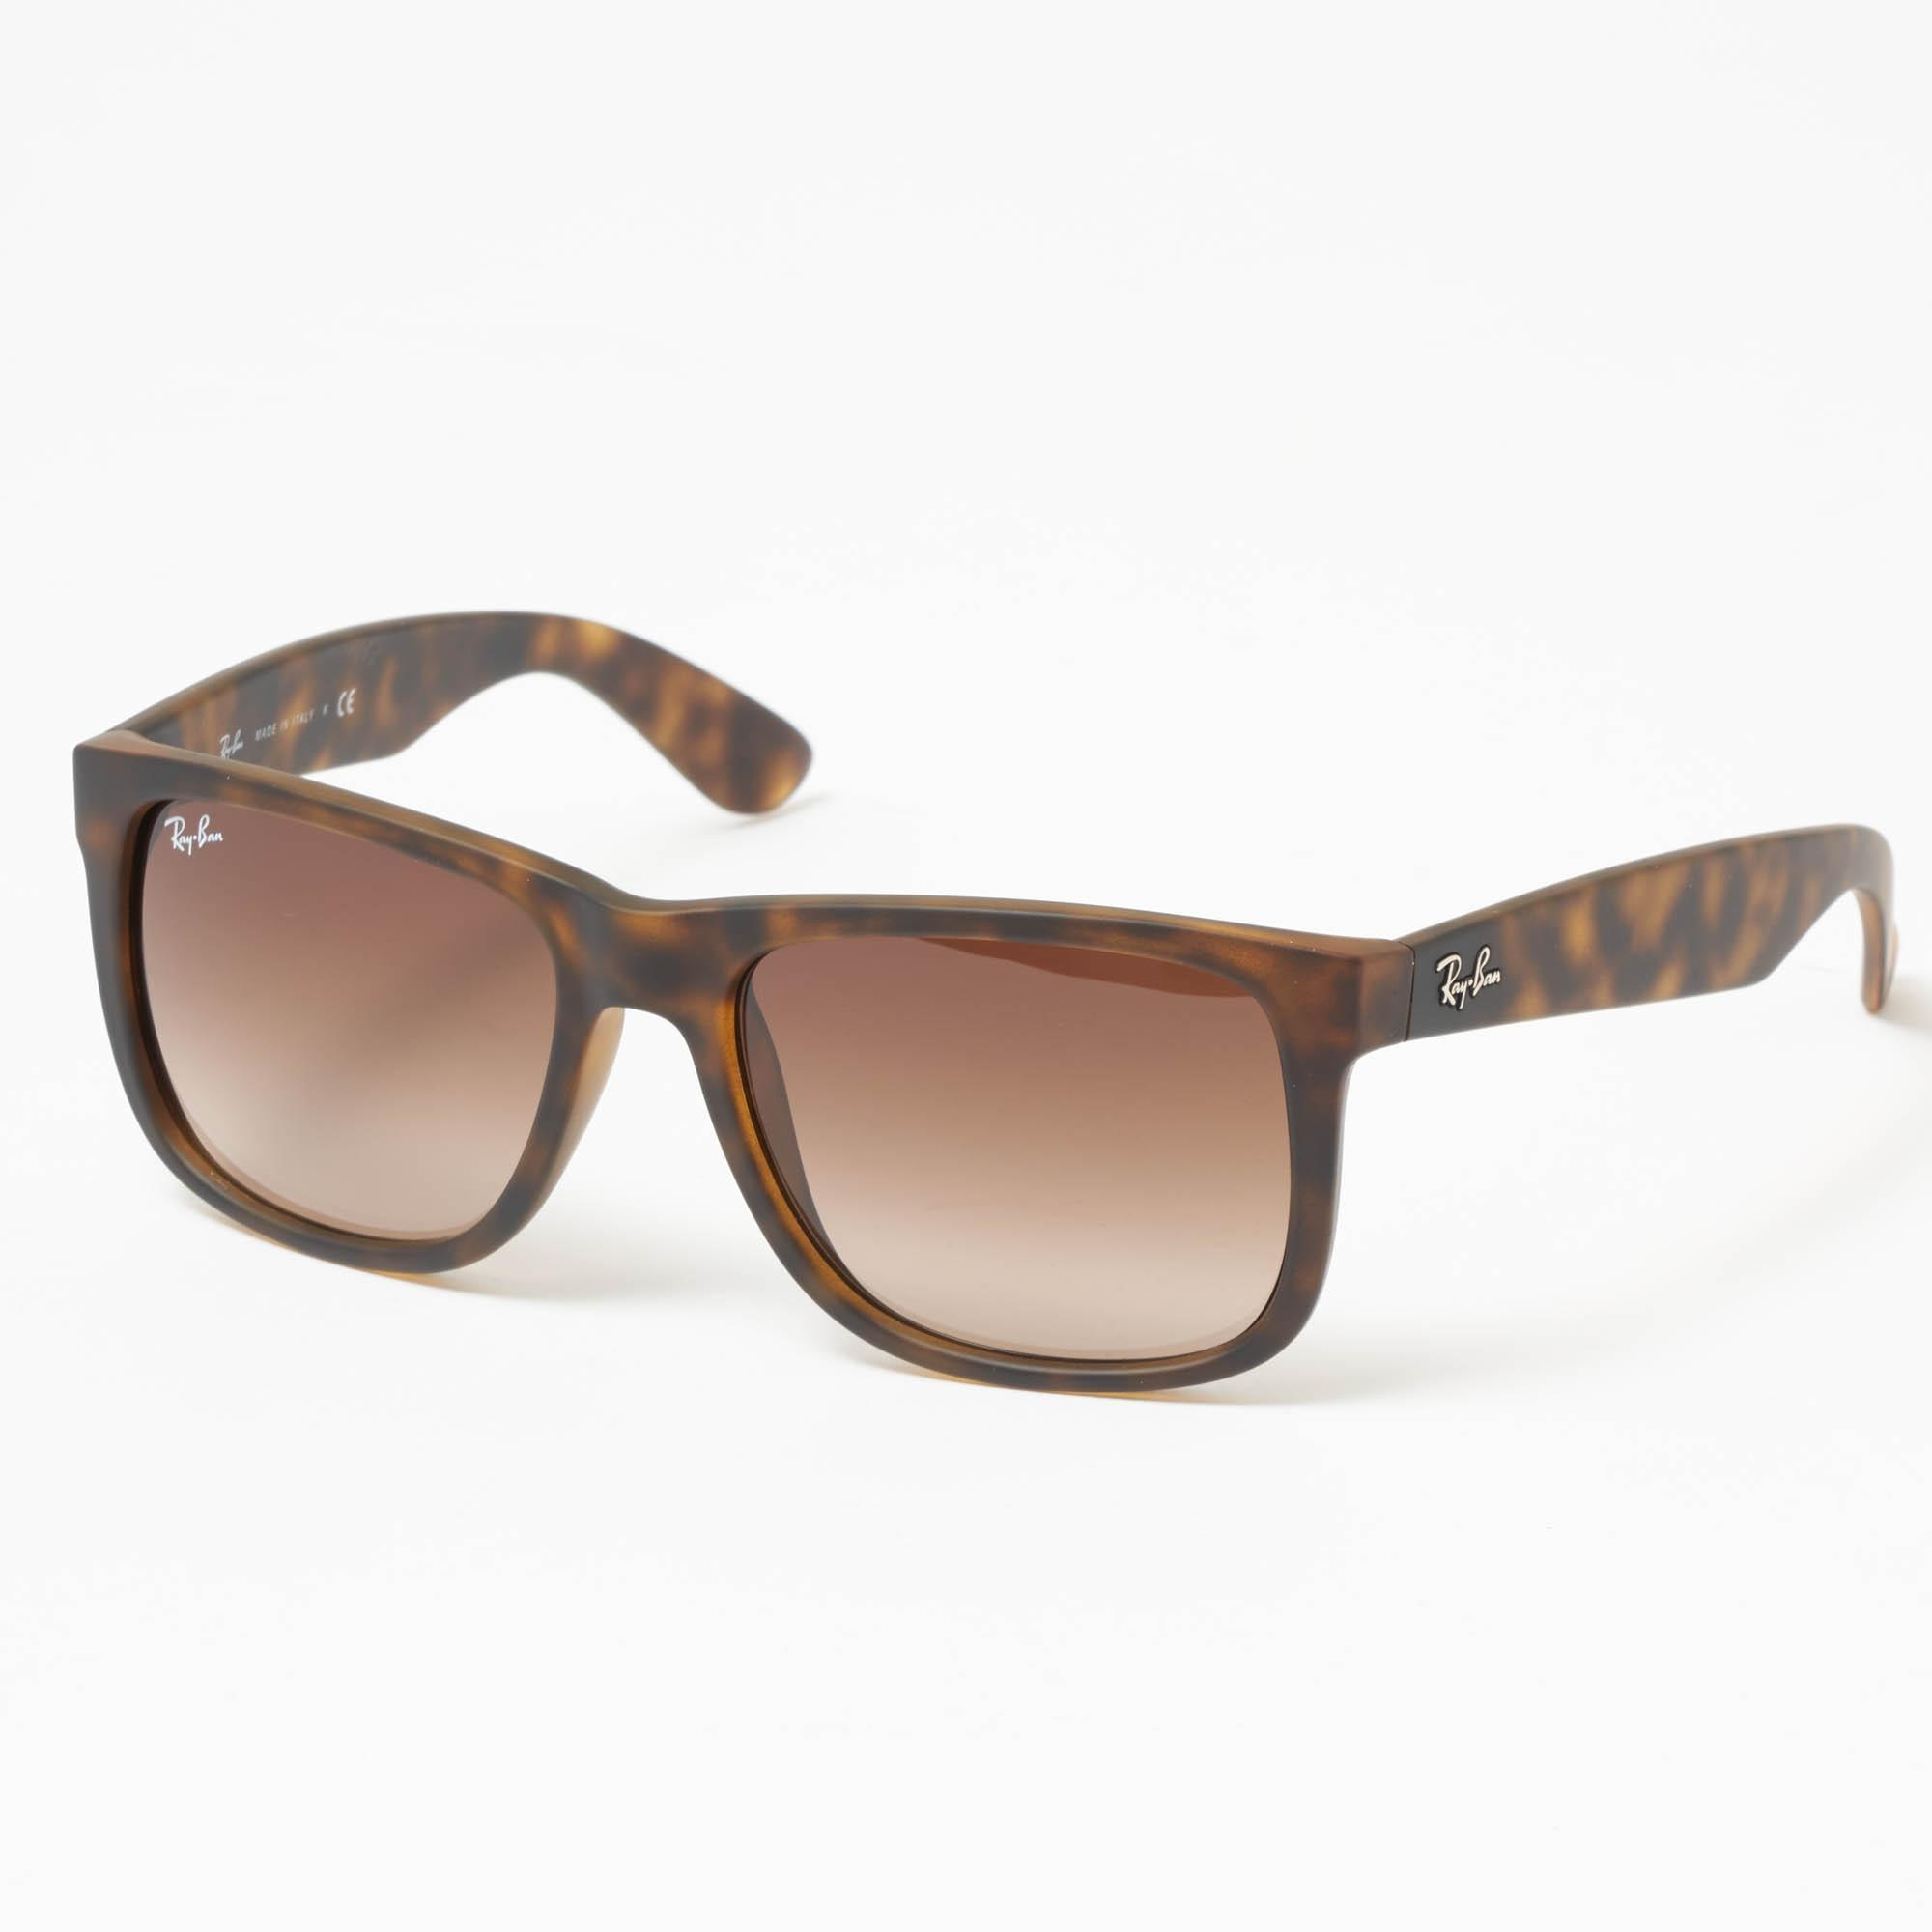 77d84ce206 Ray-Ban Tortoise Justin Sunglasses - Brown Gradient Lenses for Men ...